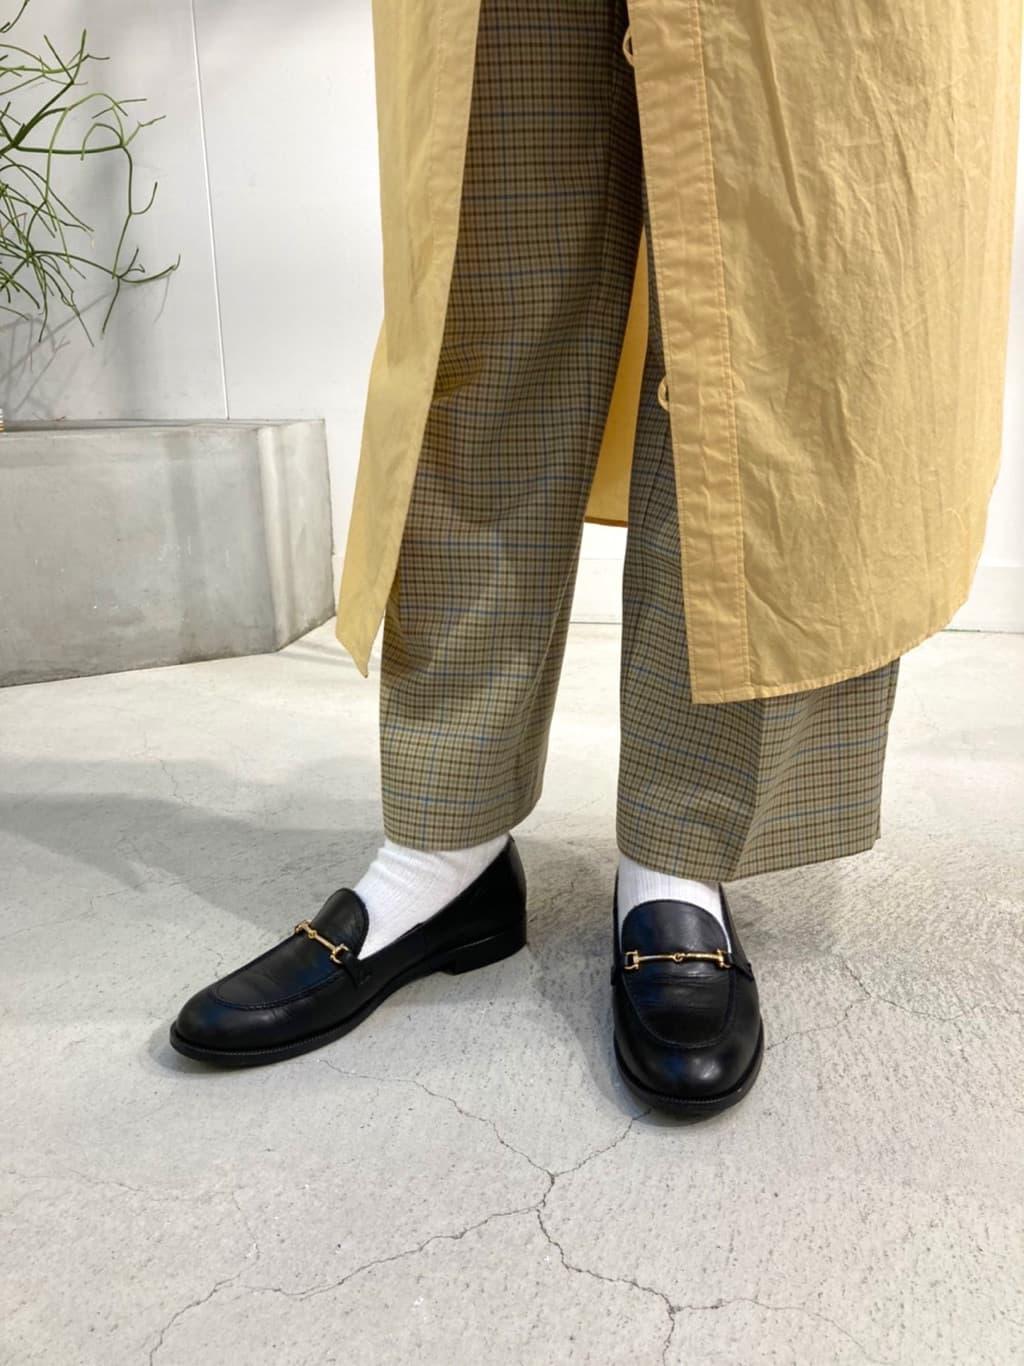 l'atelier du savon 名古屋栄路面 身長:161cm 2021.09.09